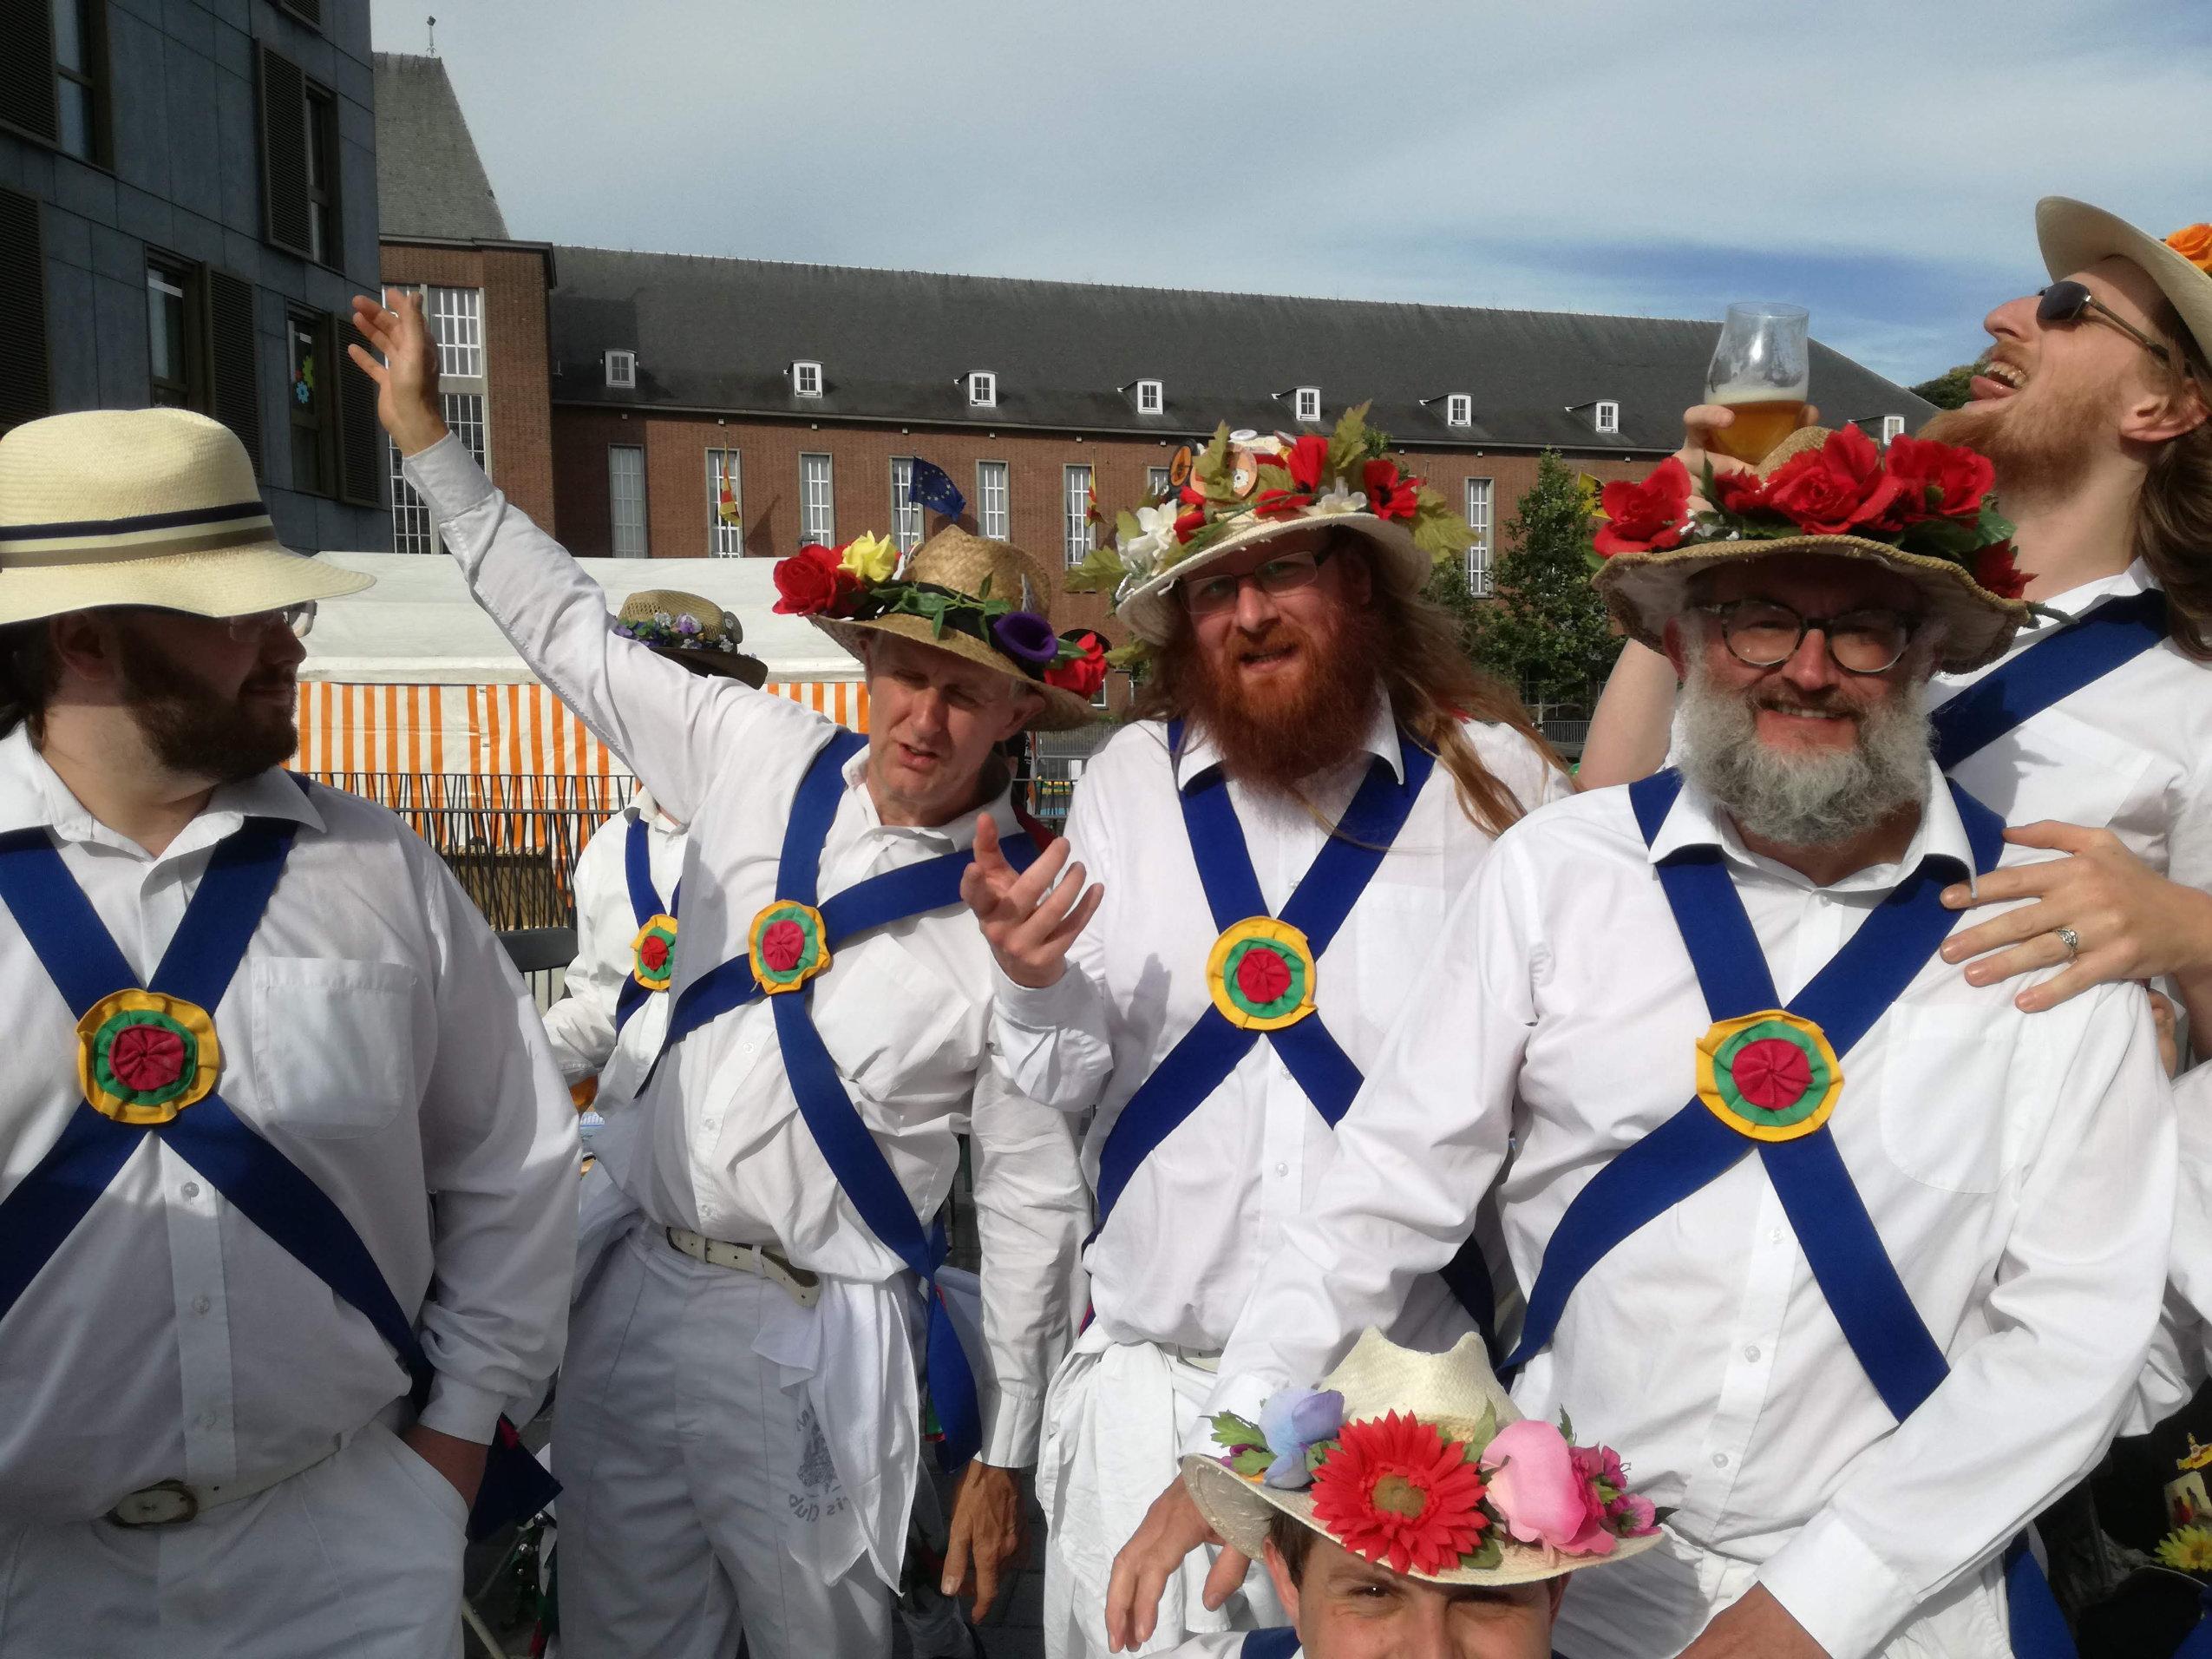 Socialising in Mortsel - Flanders